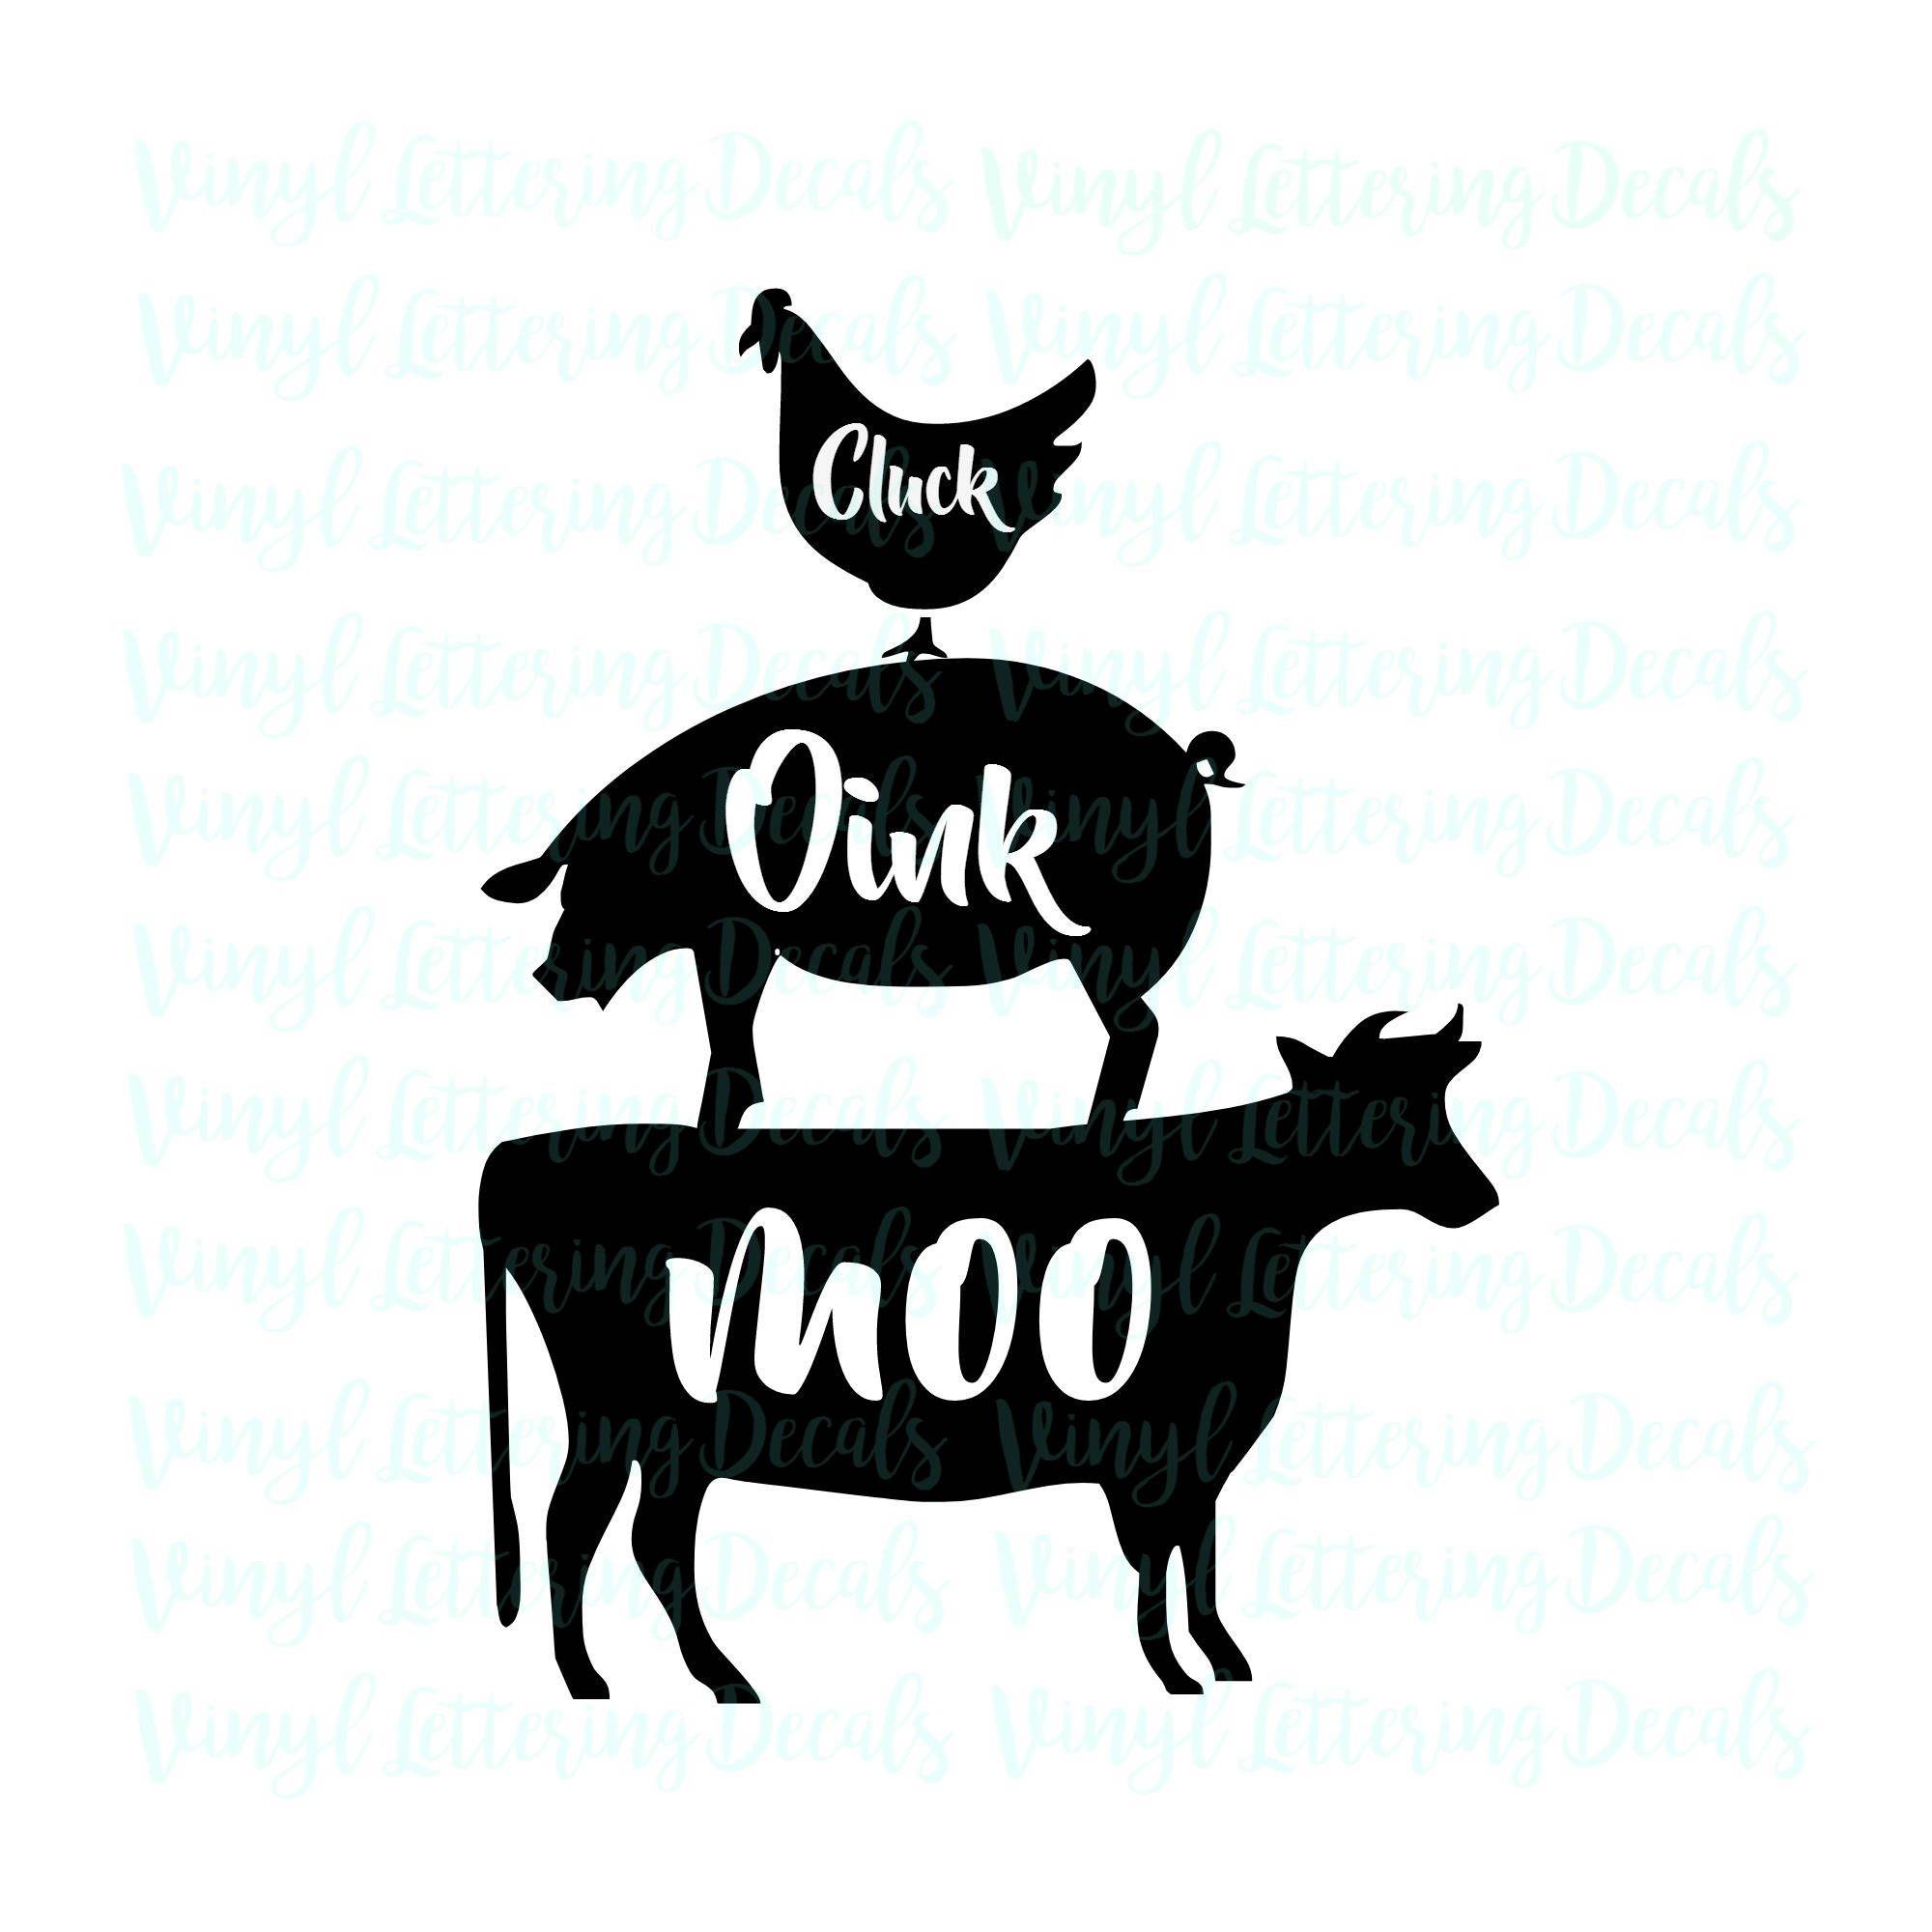 2000x2000 Pin By Tia Mimi Designs On Cricut Cricut, Silhouette